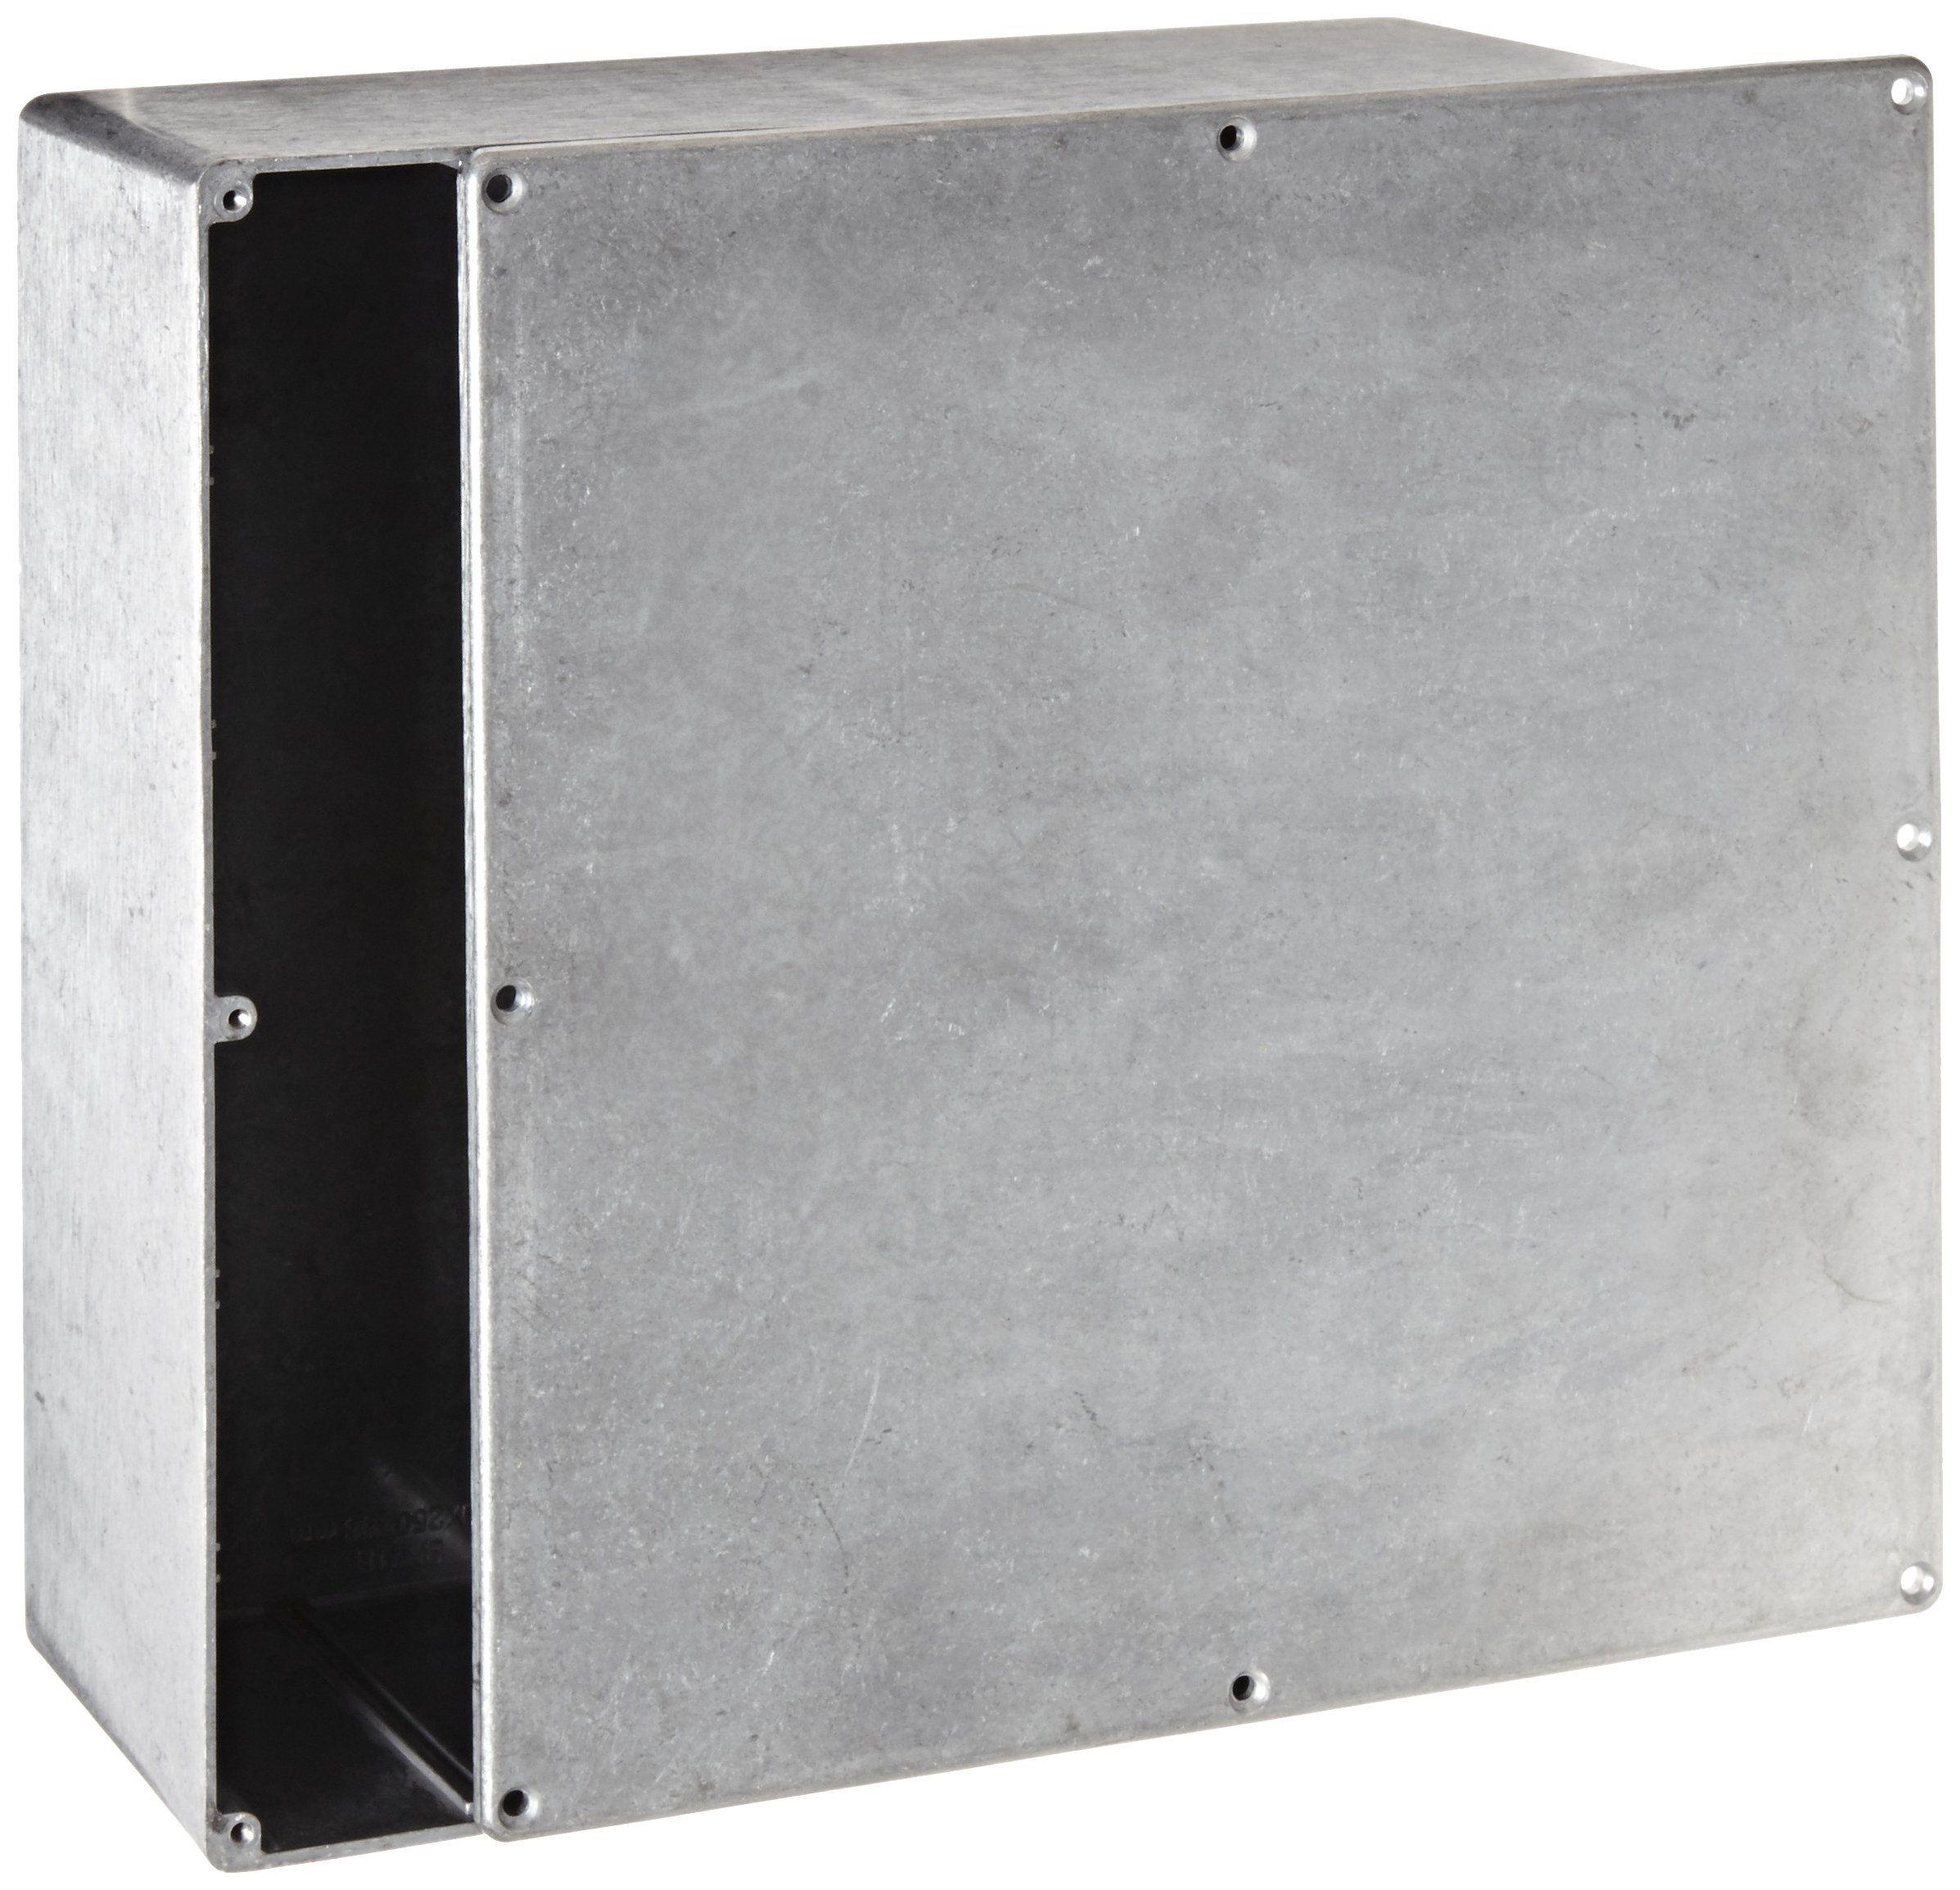 Bud Industries Cn5713 Die Cast Aluminum Enclosure 927 32 Length X 927 32 Width X 4 Height Natura Home Improvement Tall Cabinet Storage Locker Storage